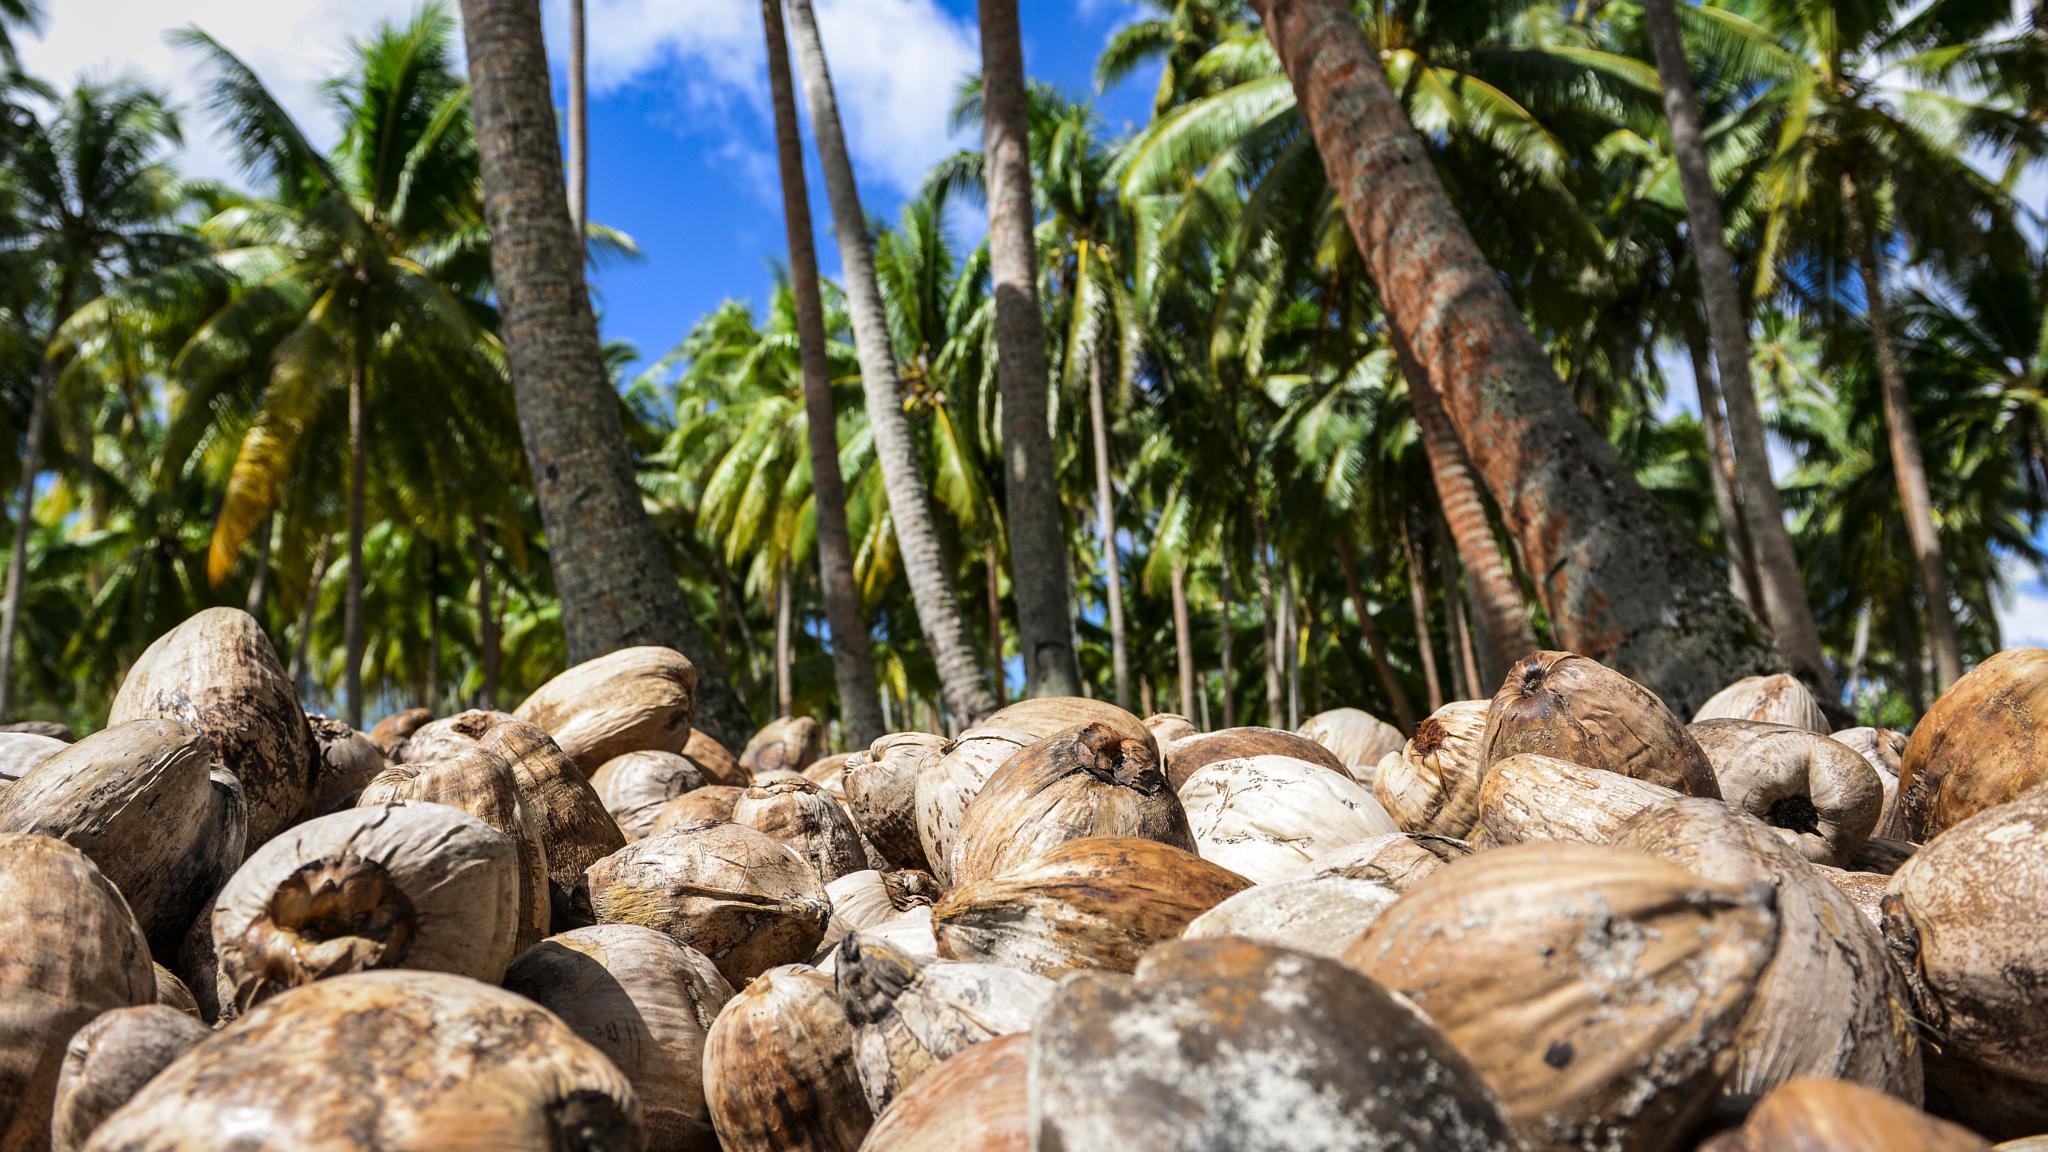 Coconut by Thomas Hubener